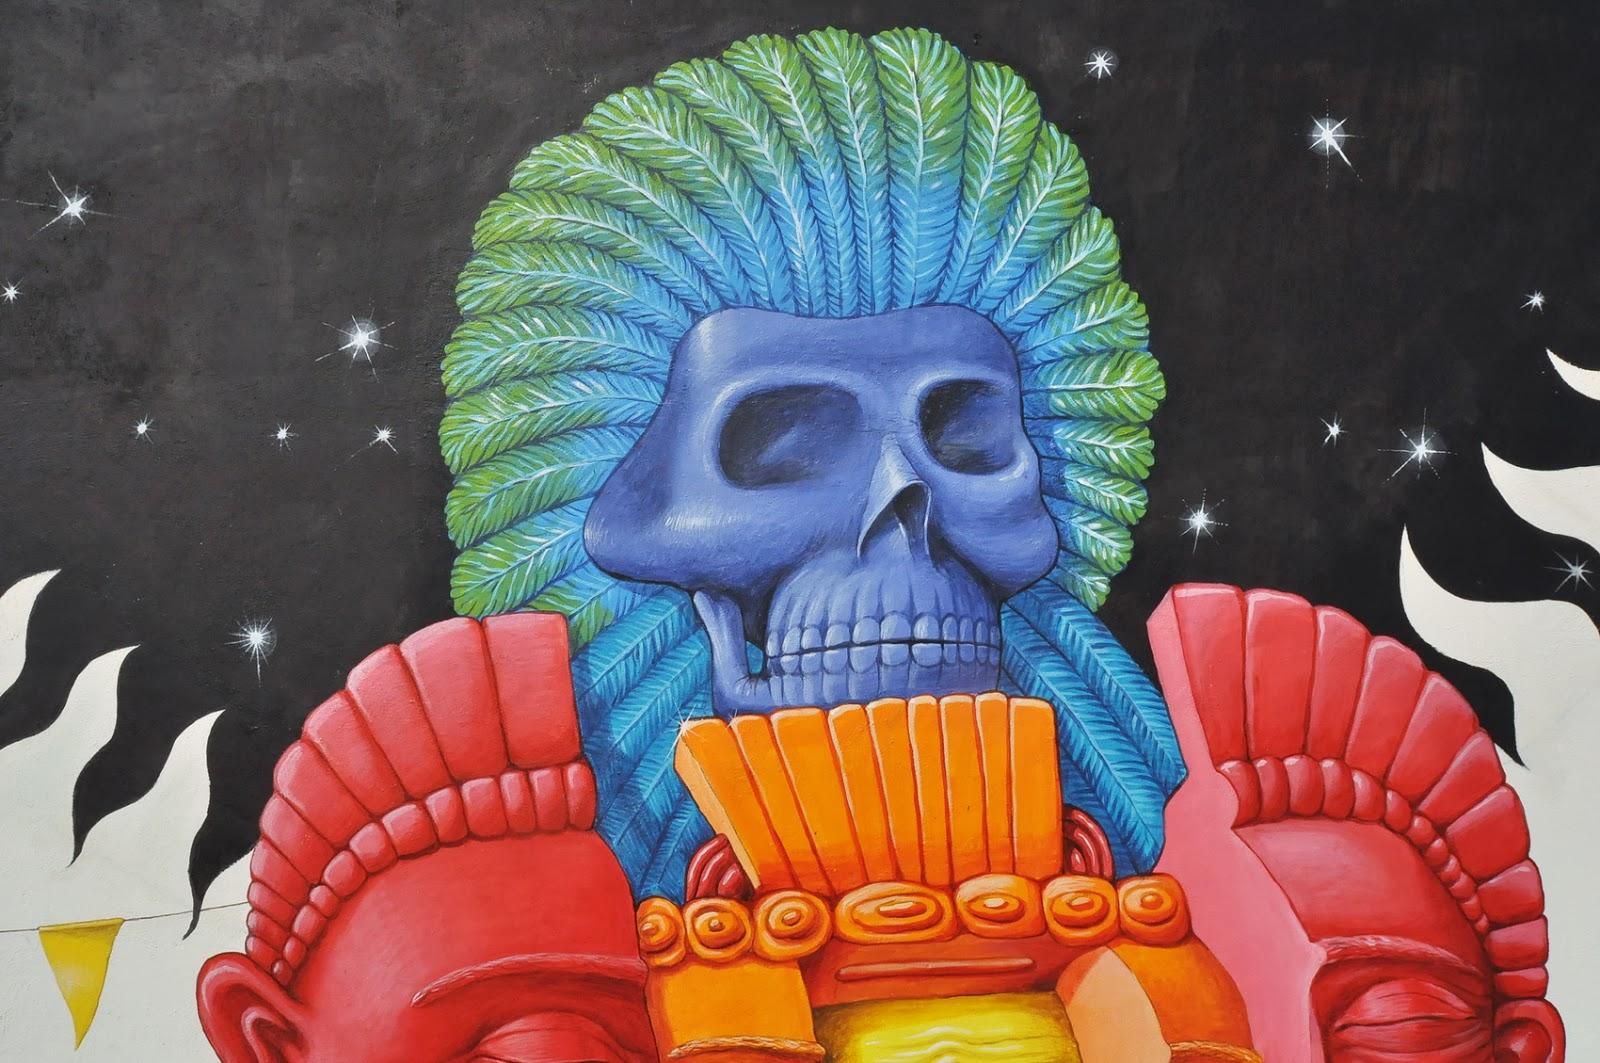 interesni-kazki-new-mural-campeche-mexico-07